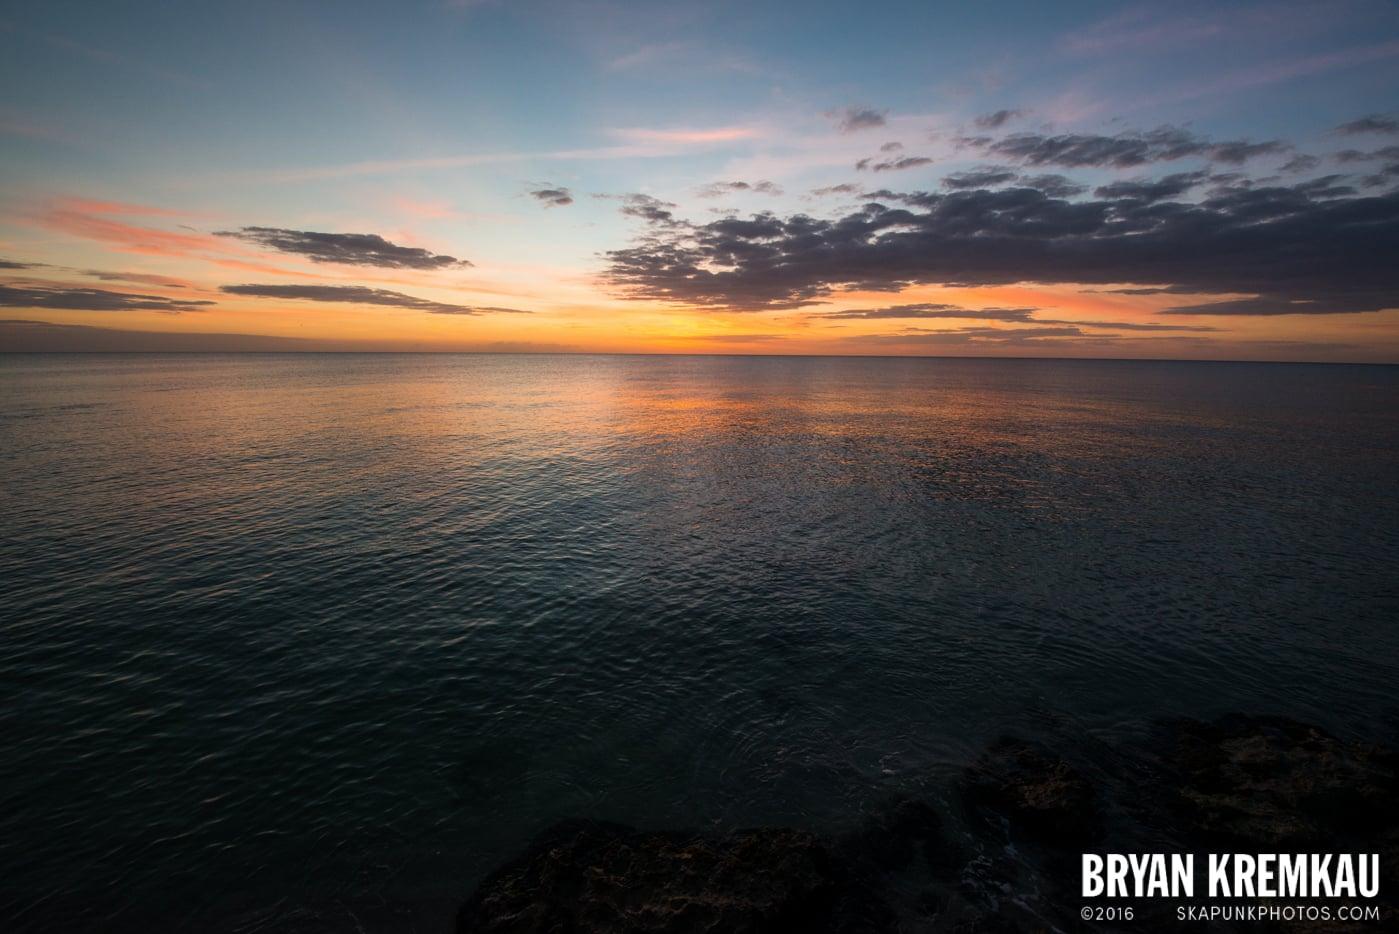 Sunsets, Astrophotography & Birds @ Venice, Florida - 10.25.14 - 11.5.14 (62)